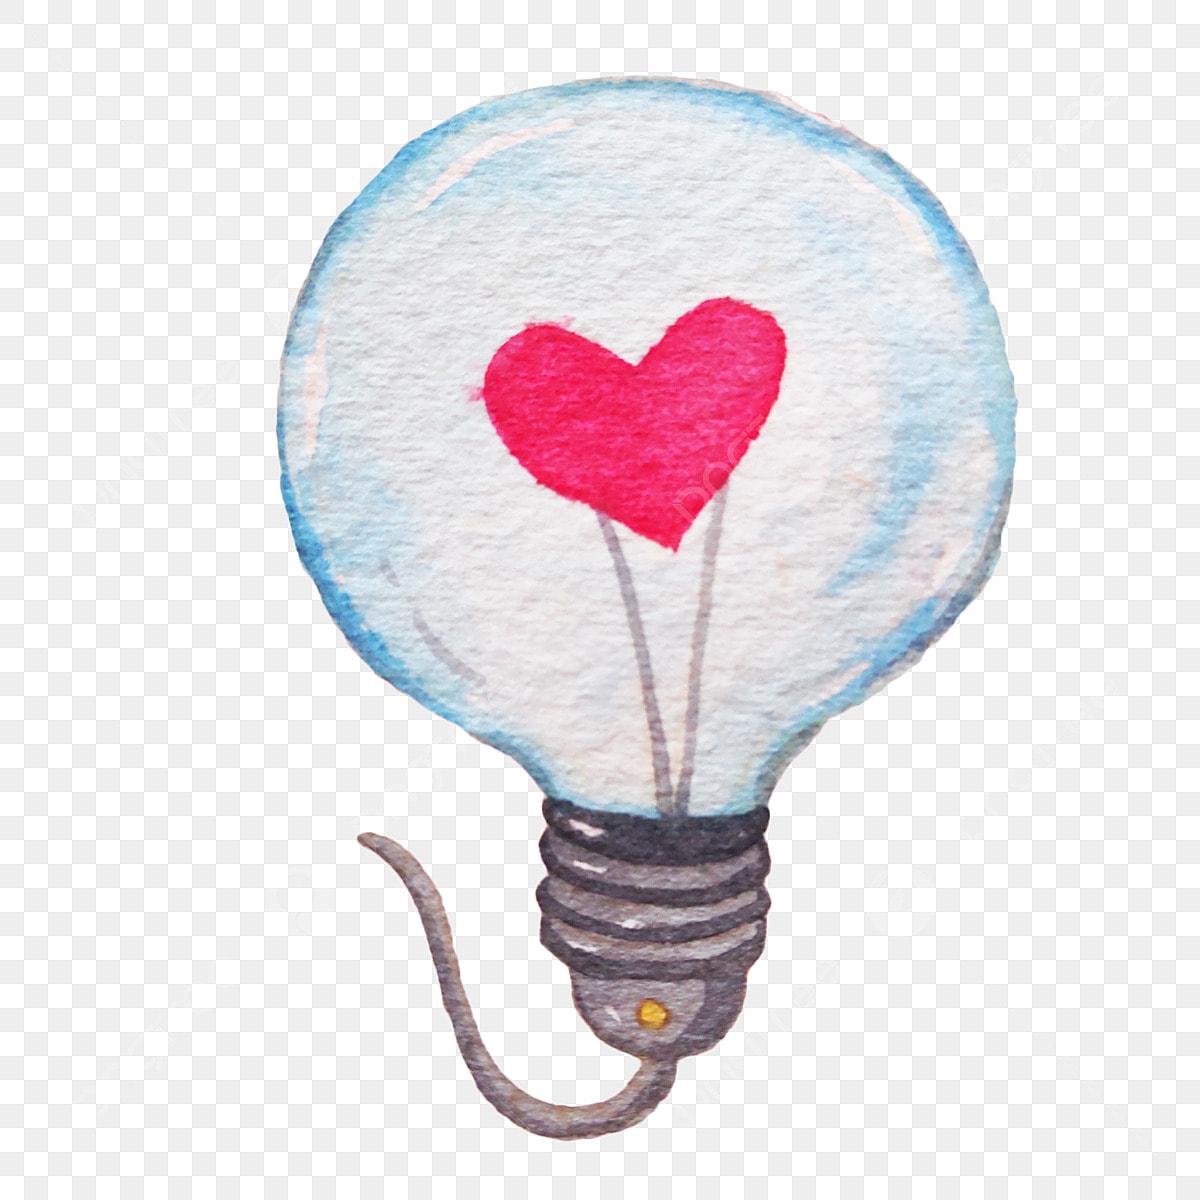 Bright Light Bulb Red Heart Shape Cartoon Illustration Hand Drawn